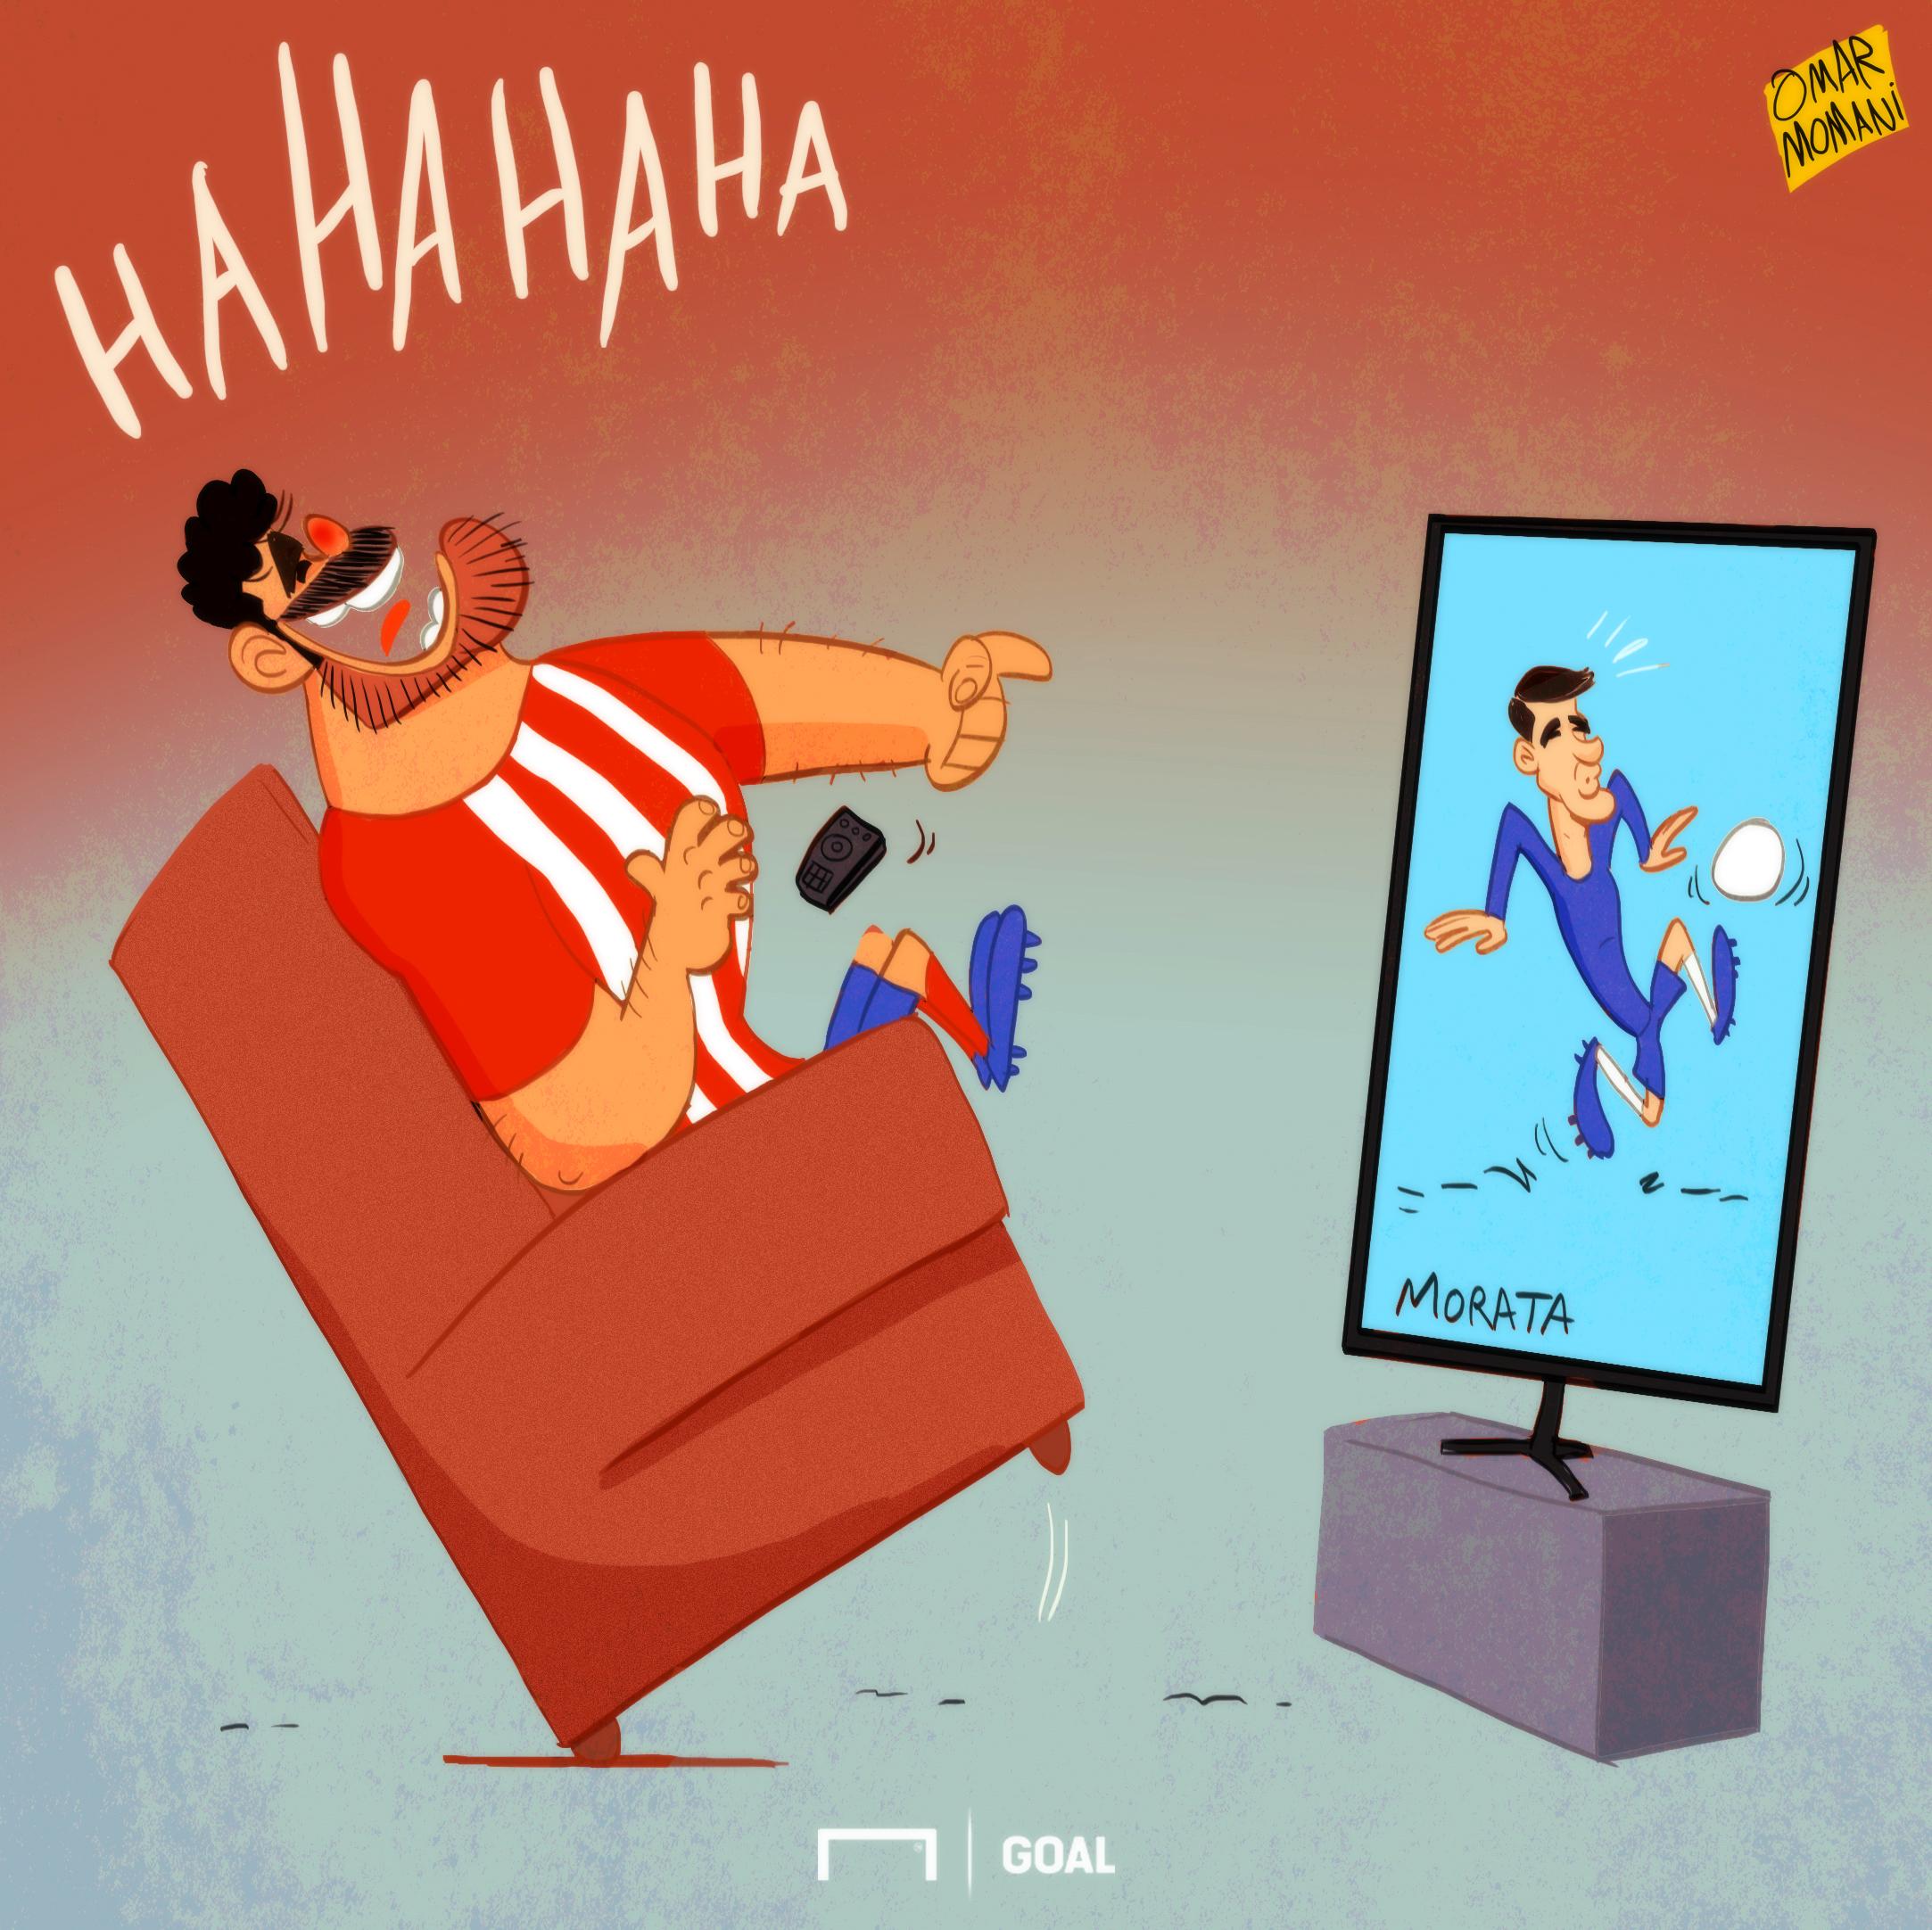 CARTOON: Costa cackles at Morata